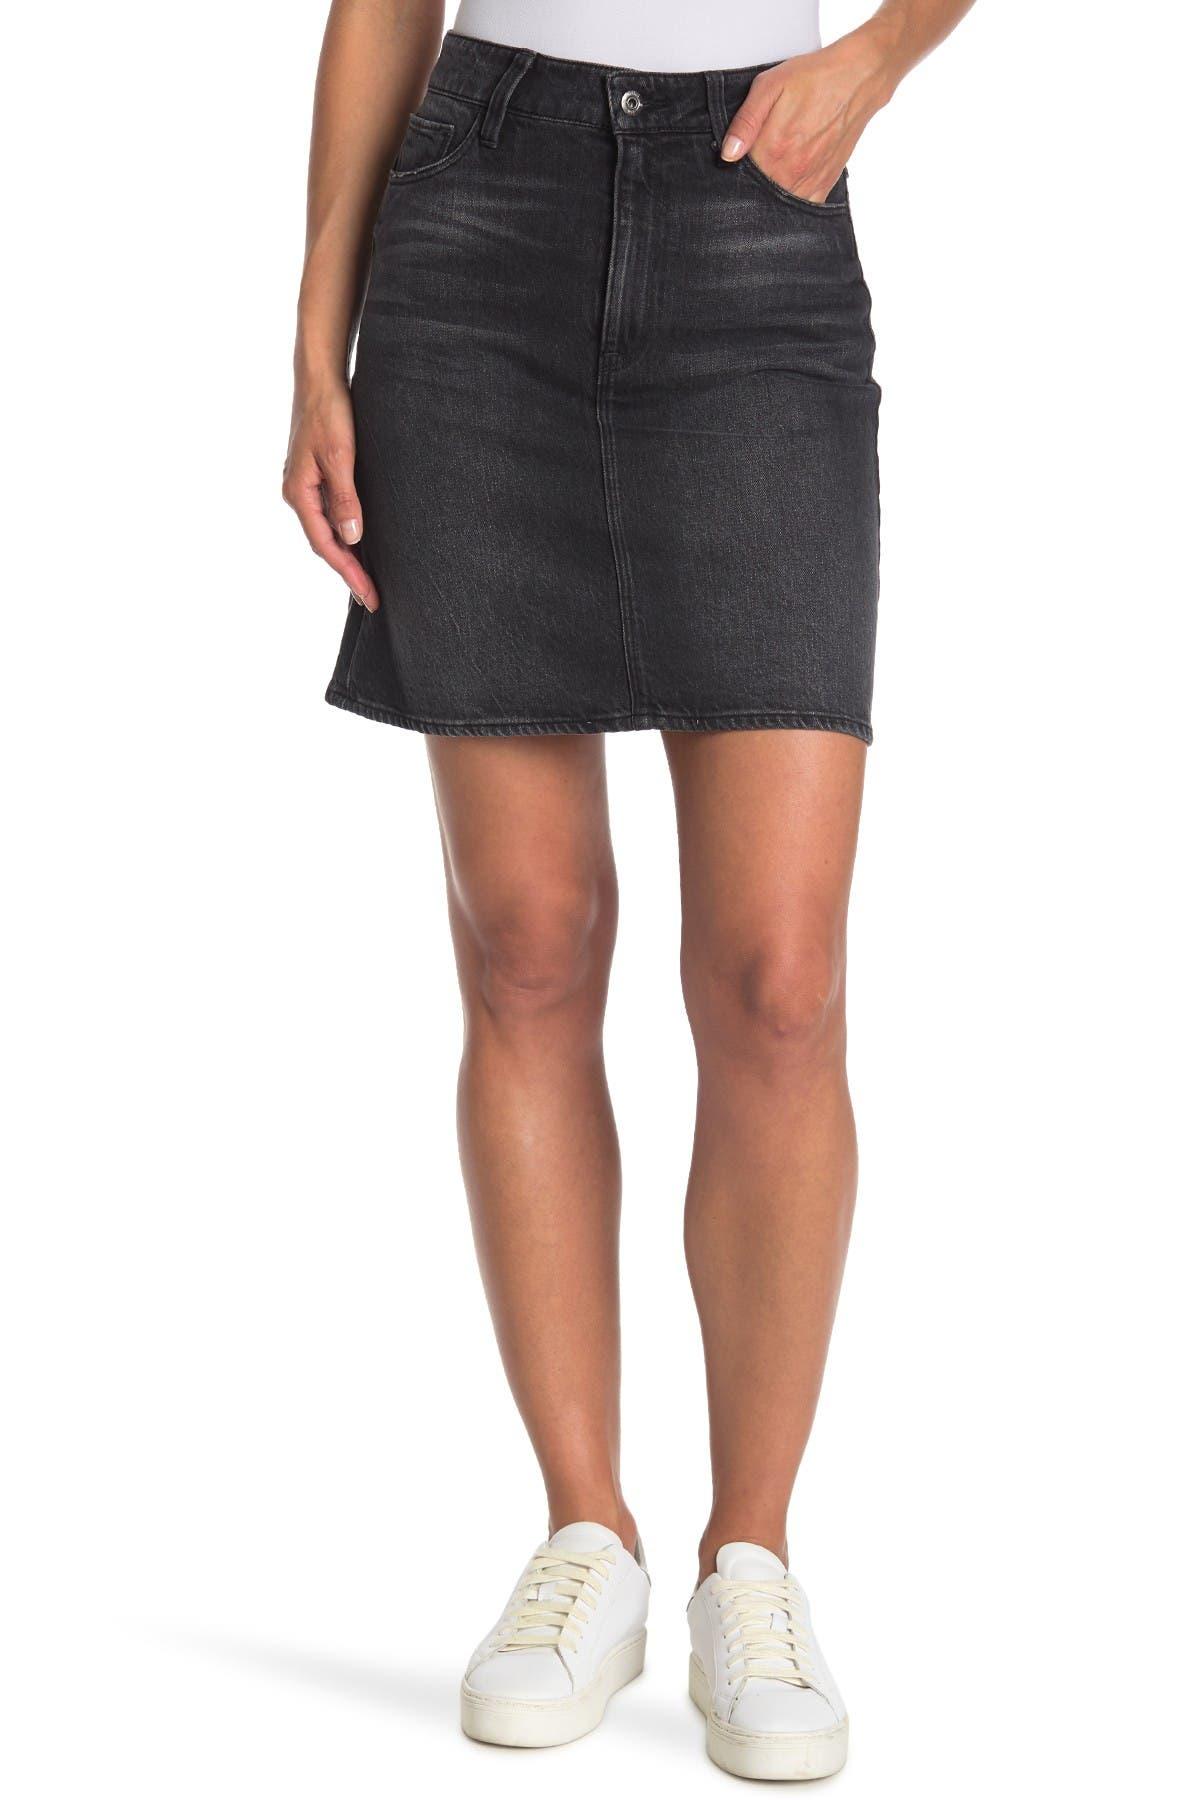 Image of G-STAR RAW 3301 Denim Skirt